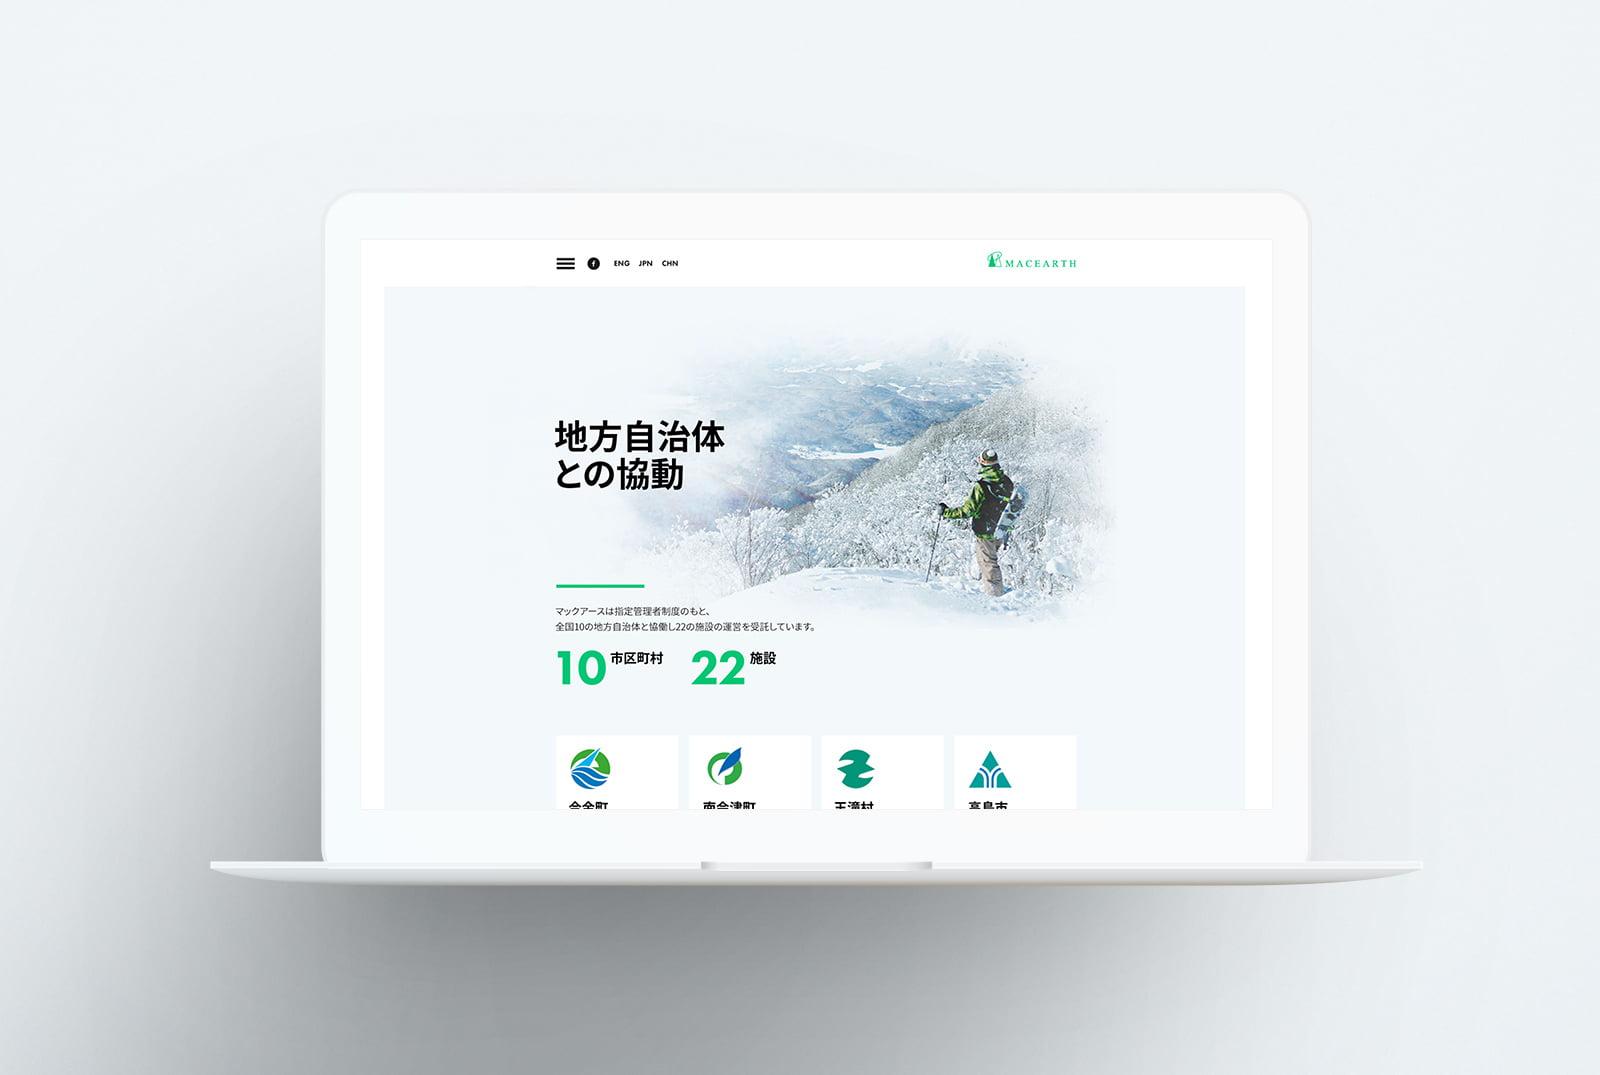 kourami-macearth-webdesign-06